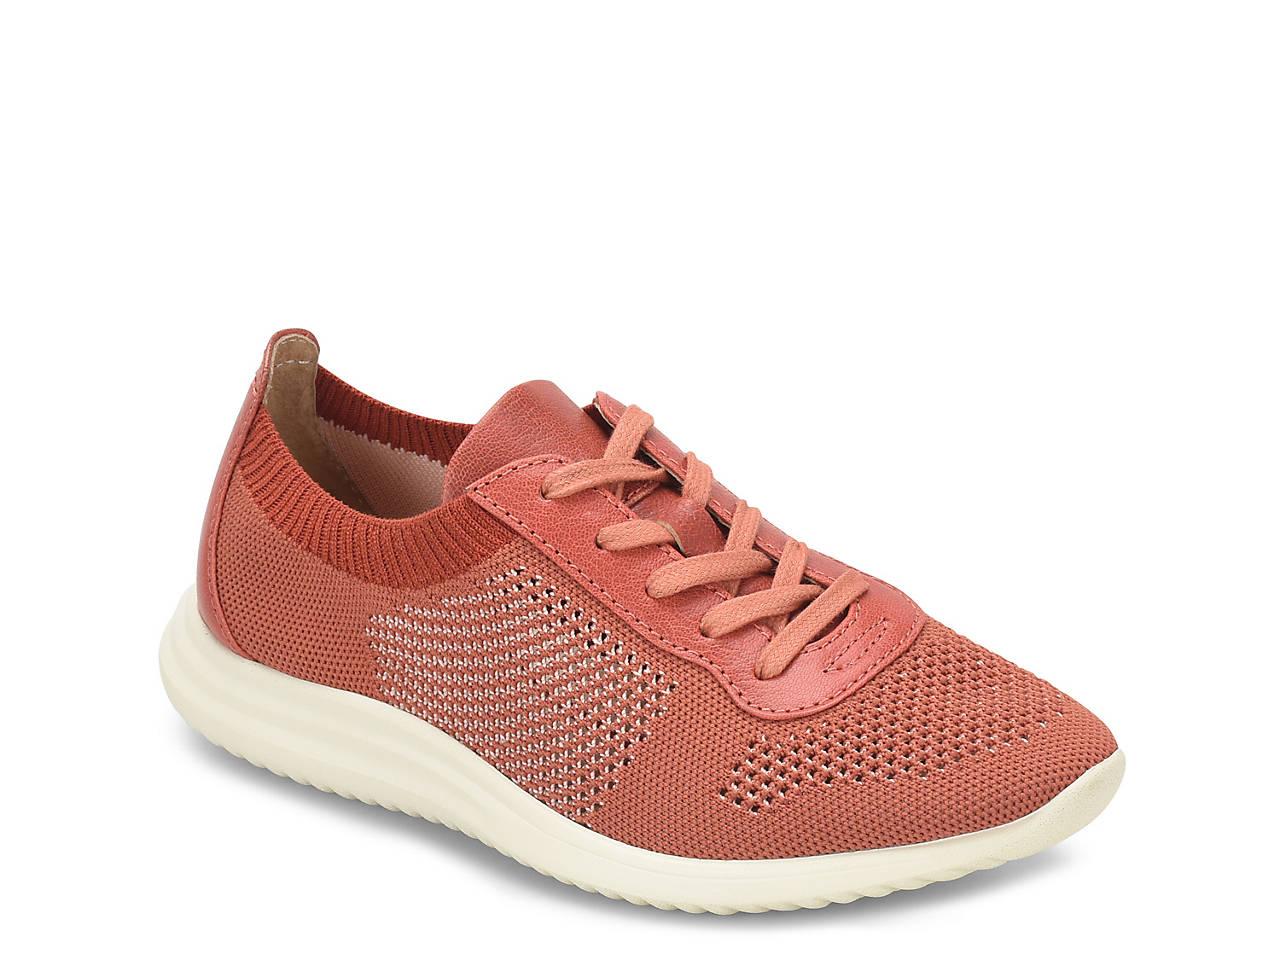 Sofft Women's Novella Sneaker ev5CS3N